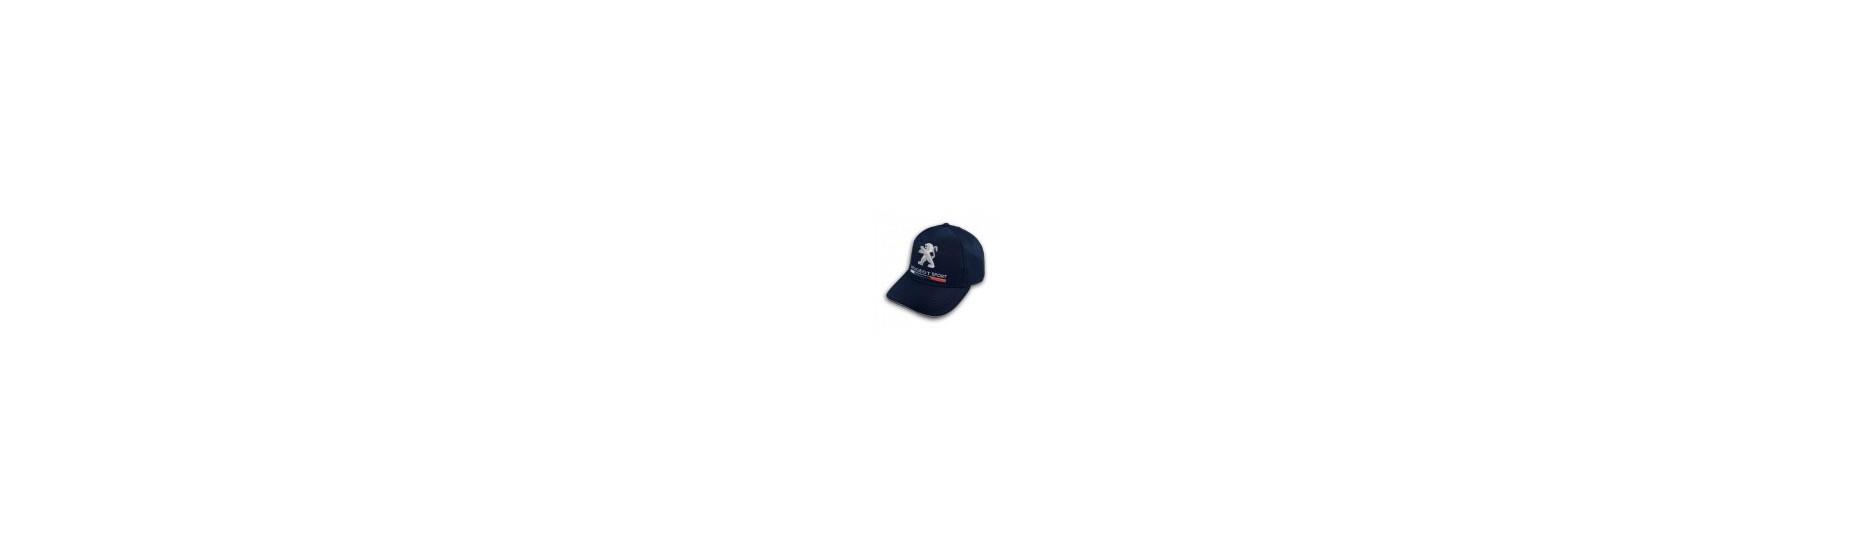 Peugeot caps and hats